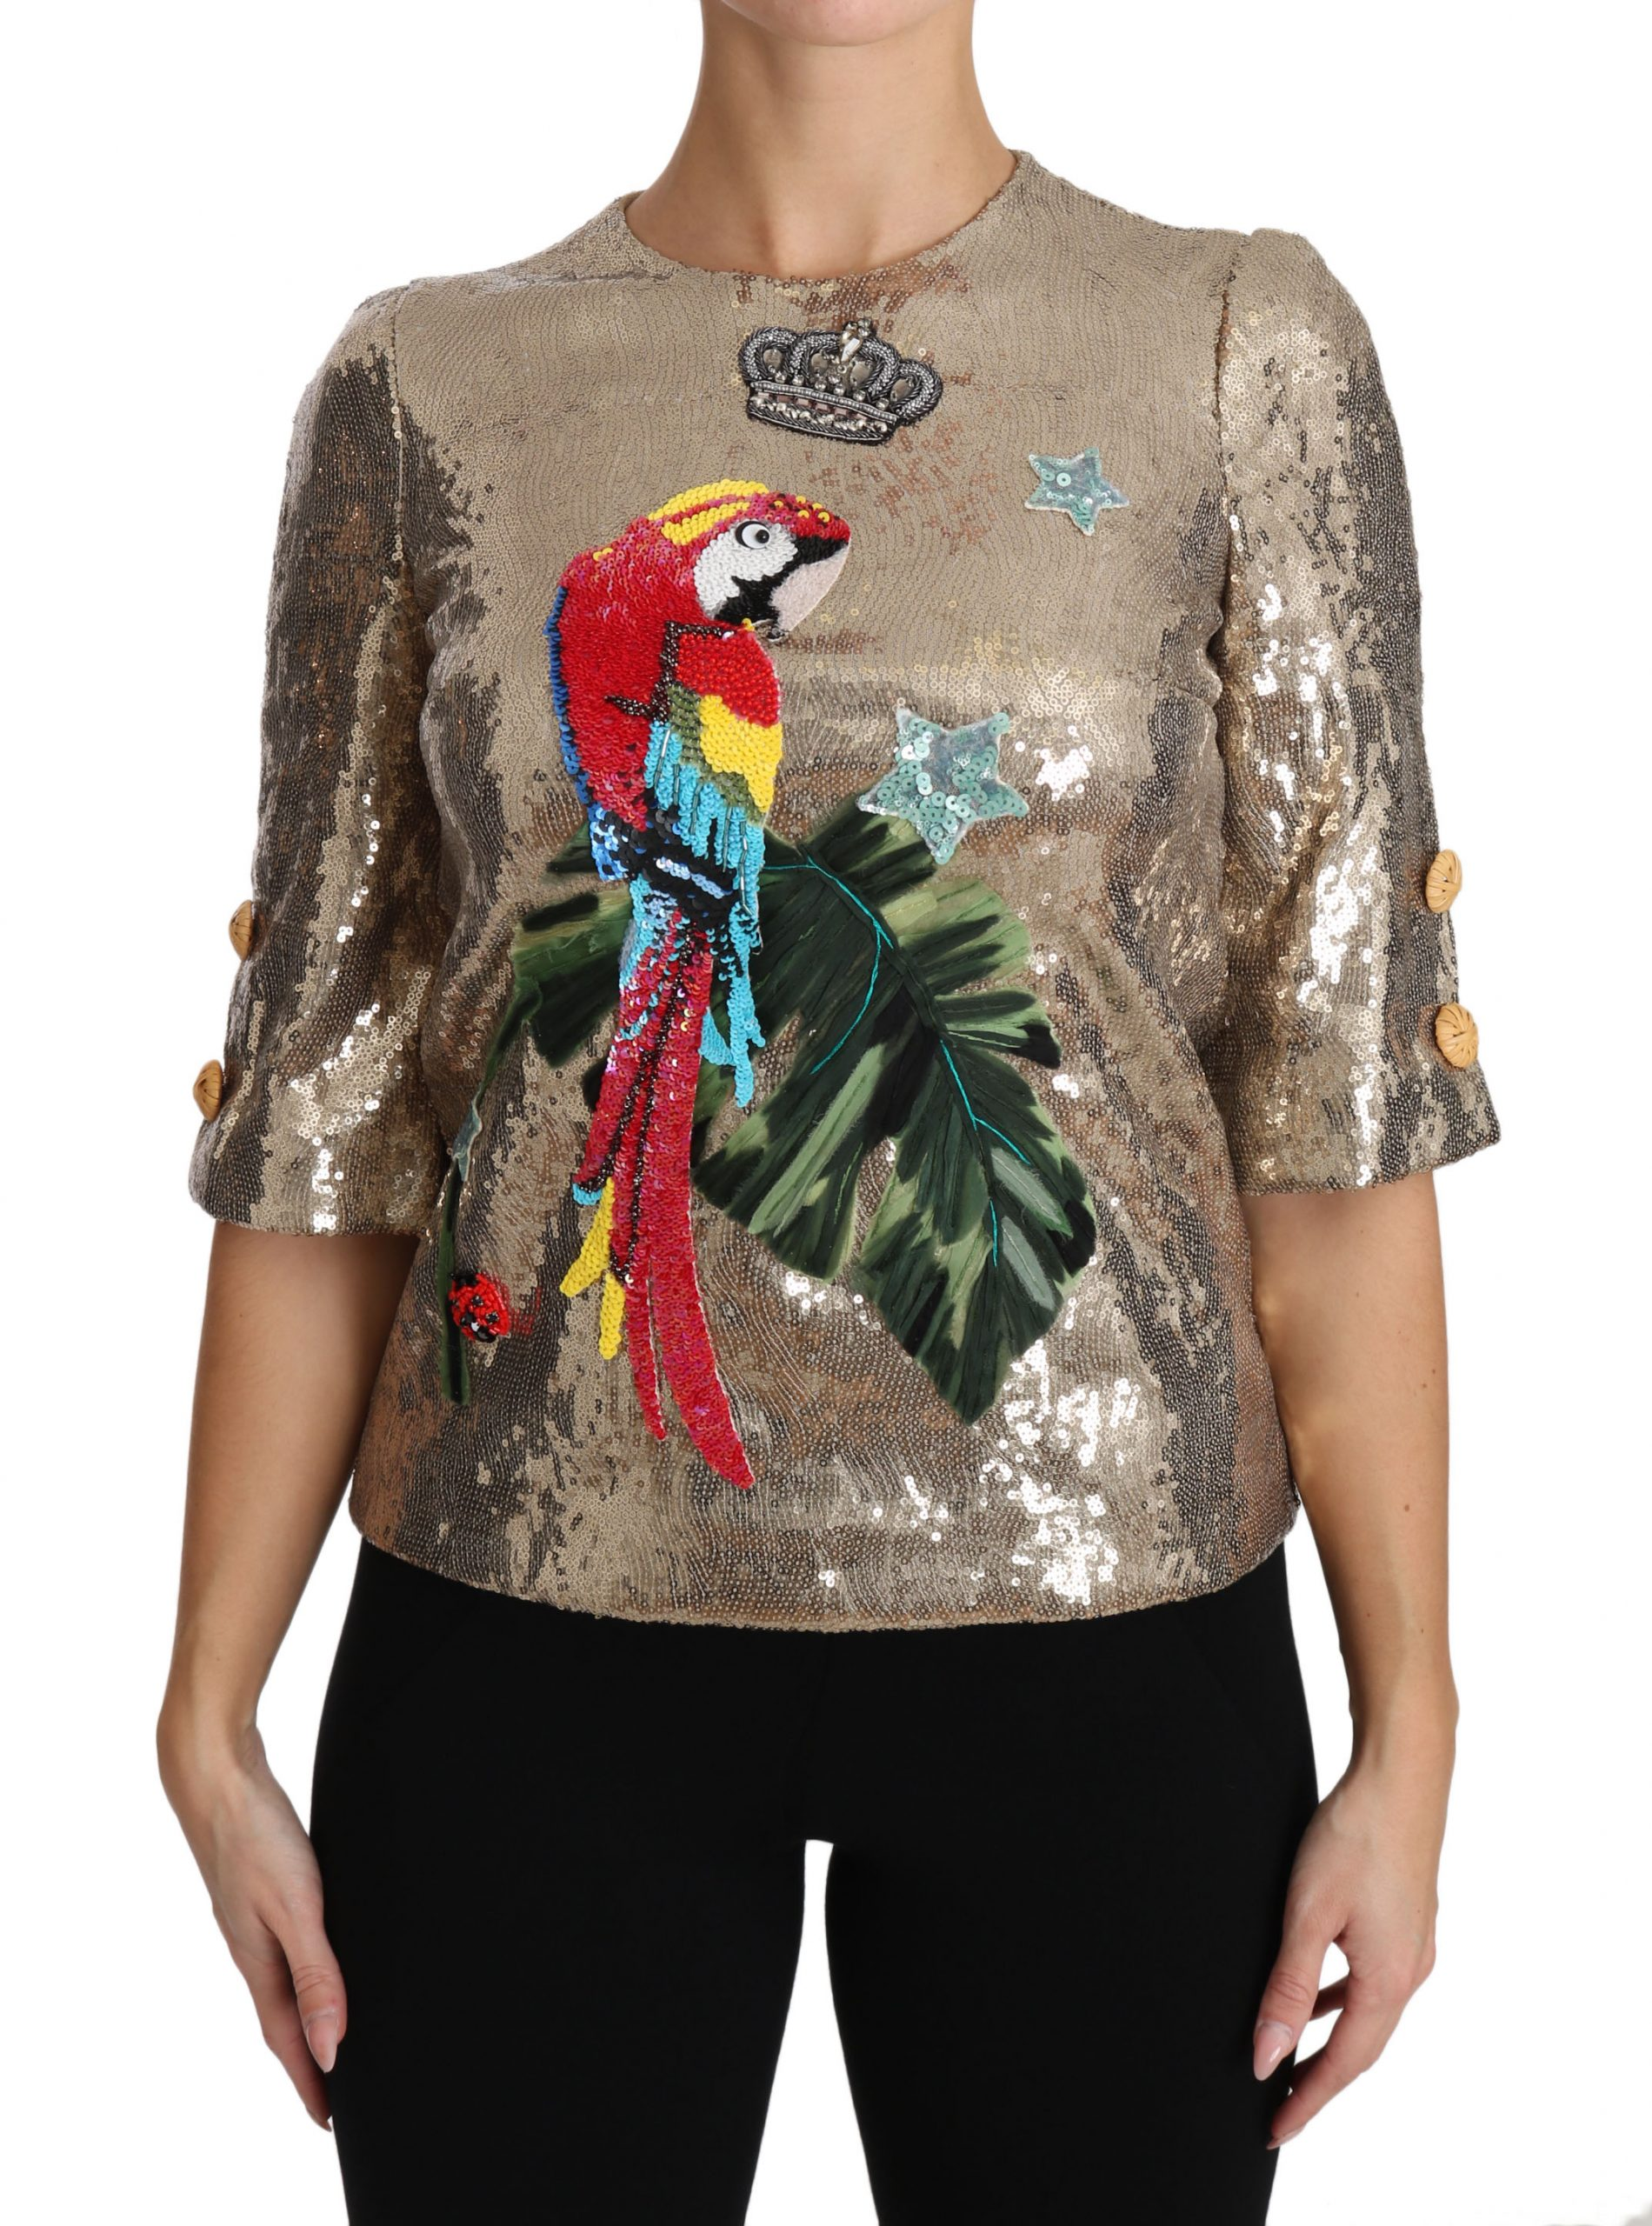 Dolce & Gabbana Women's Short Sleeve Top Gold TSH3124 - IT36 | XS